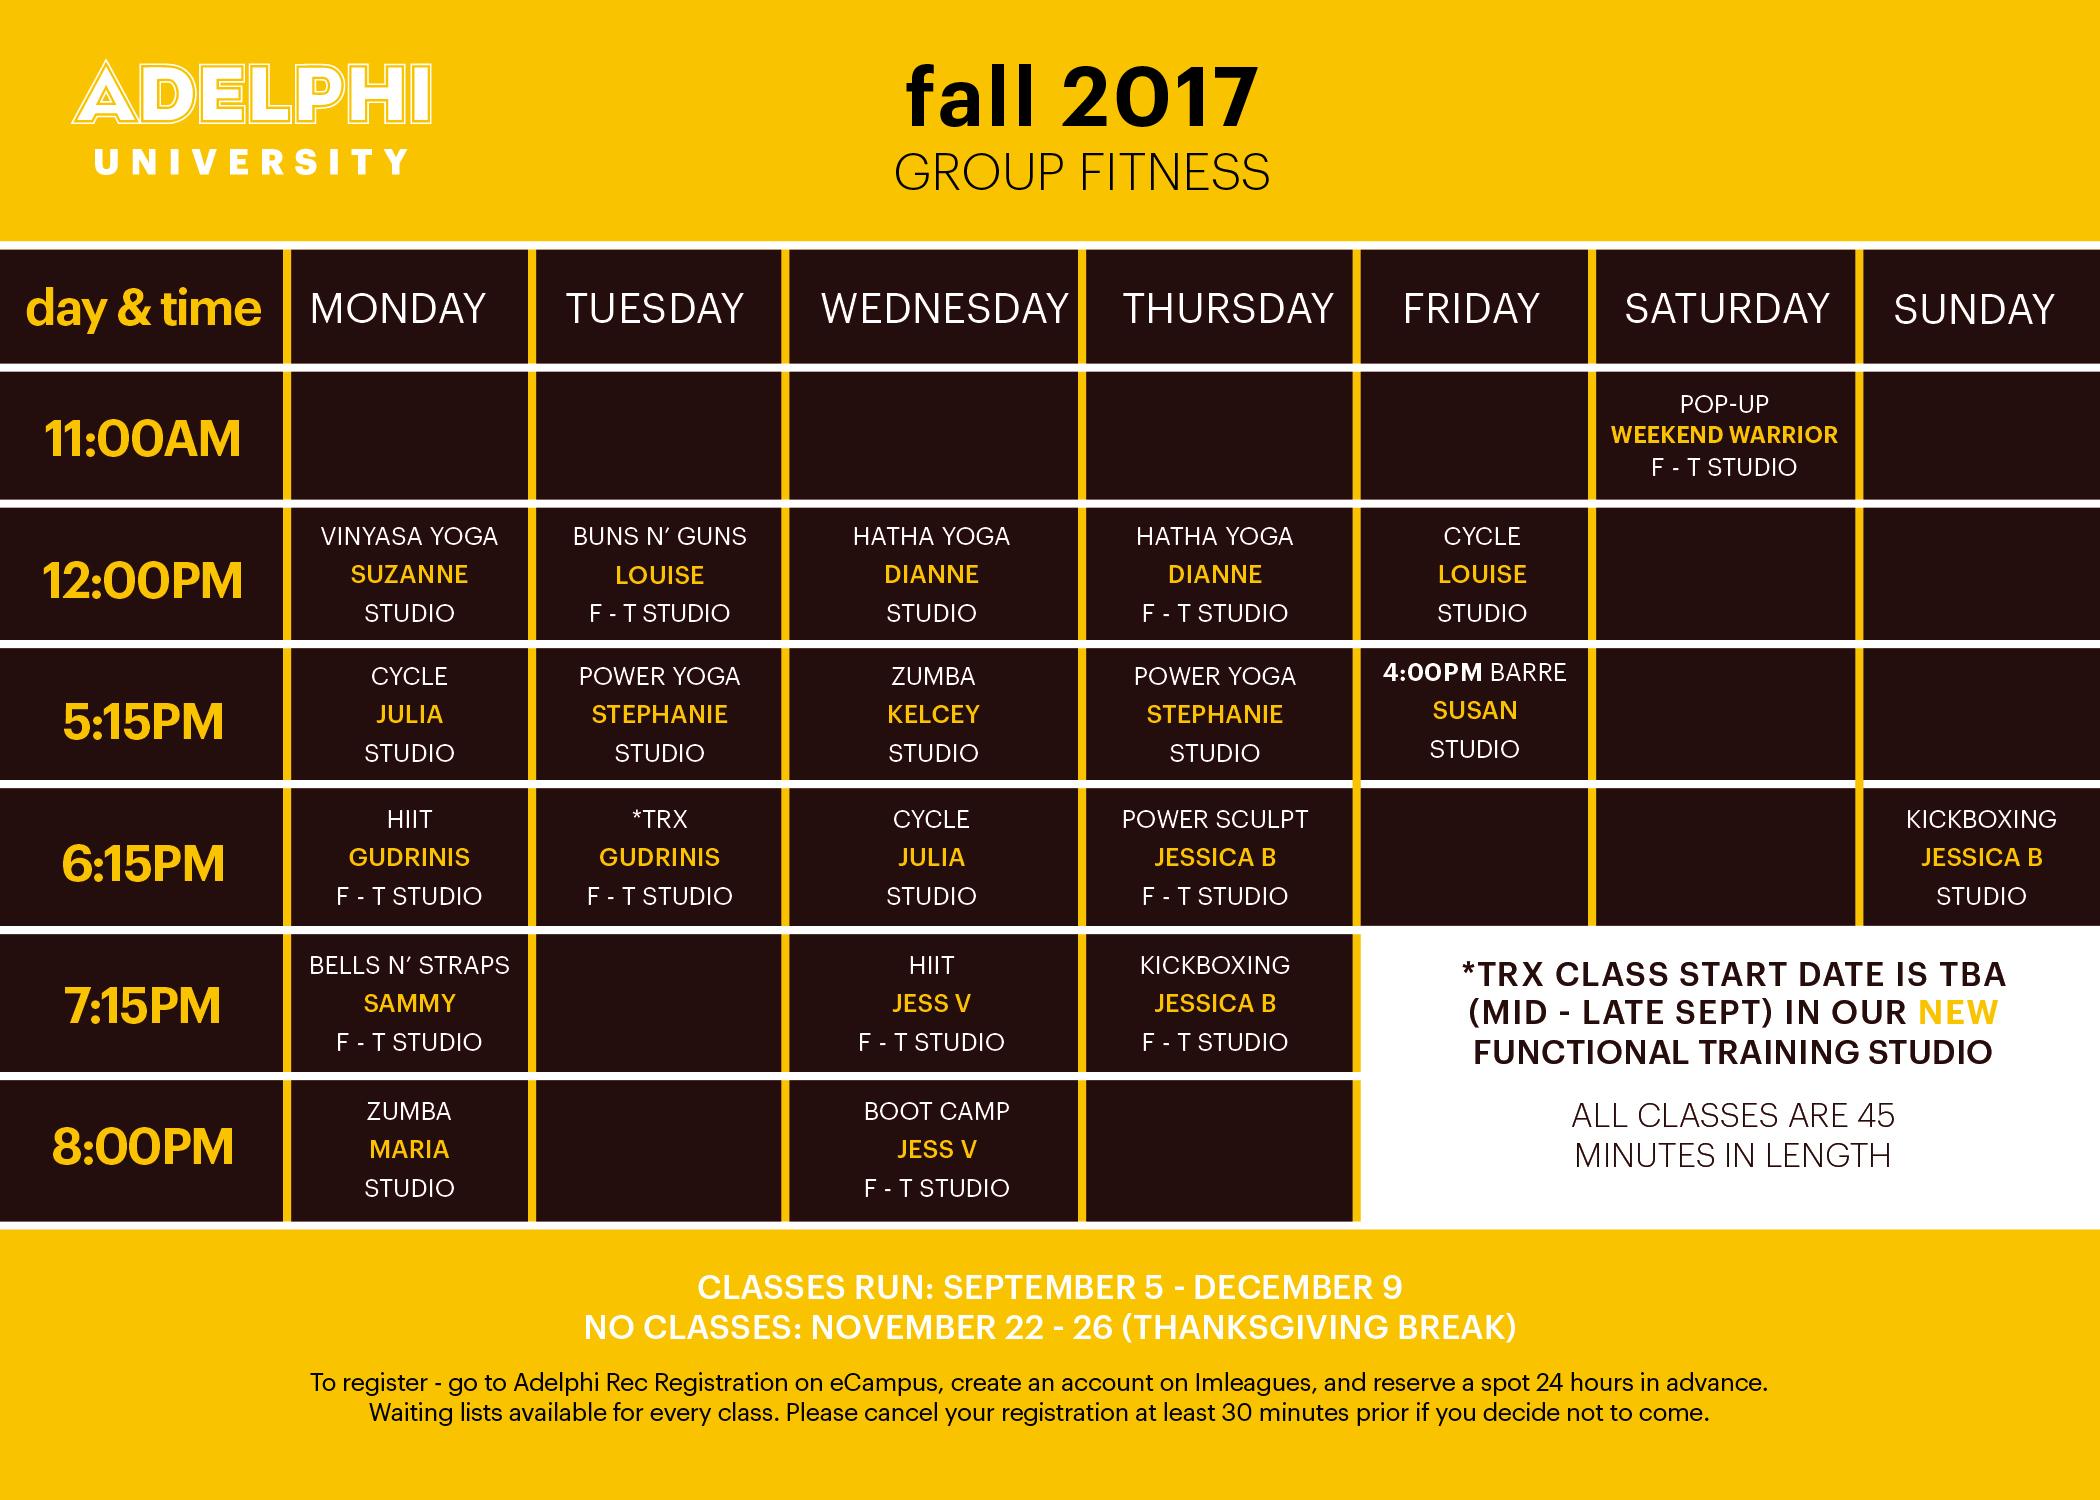 group fitness adelphi university